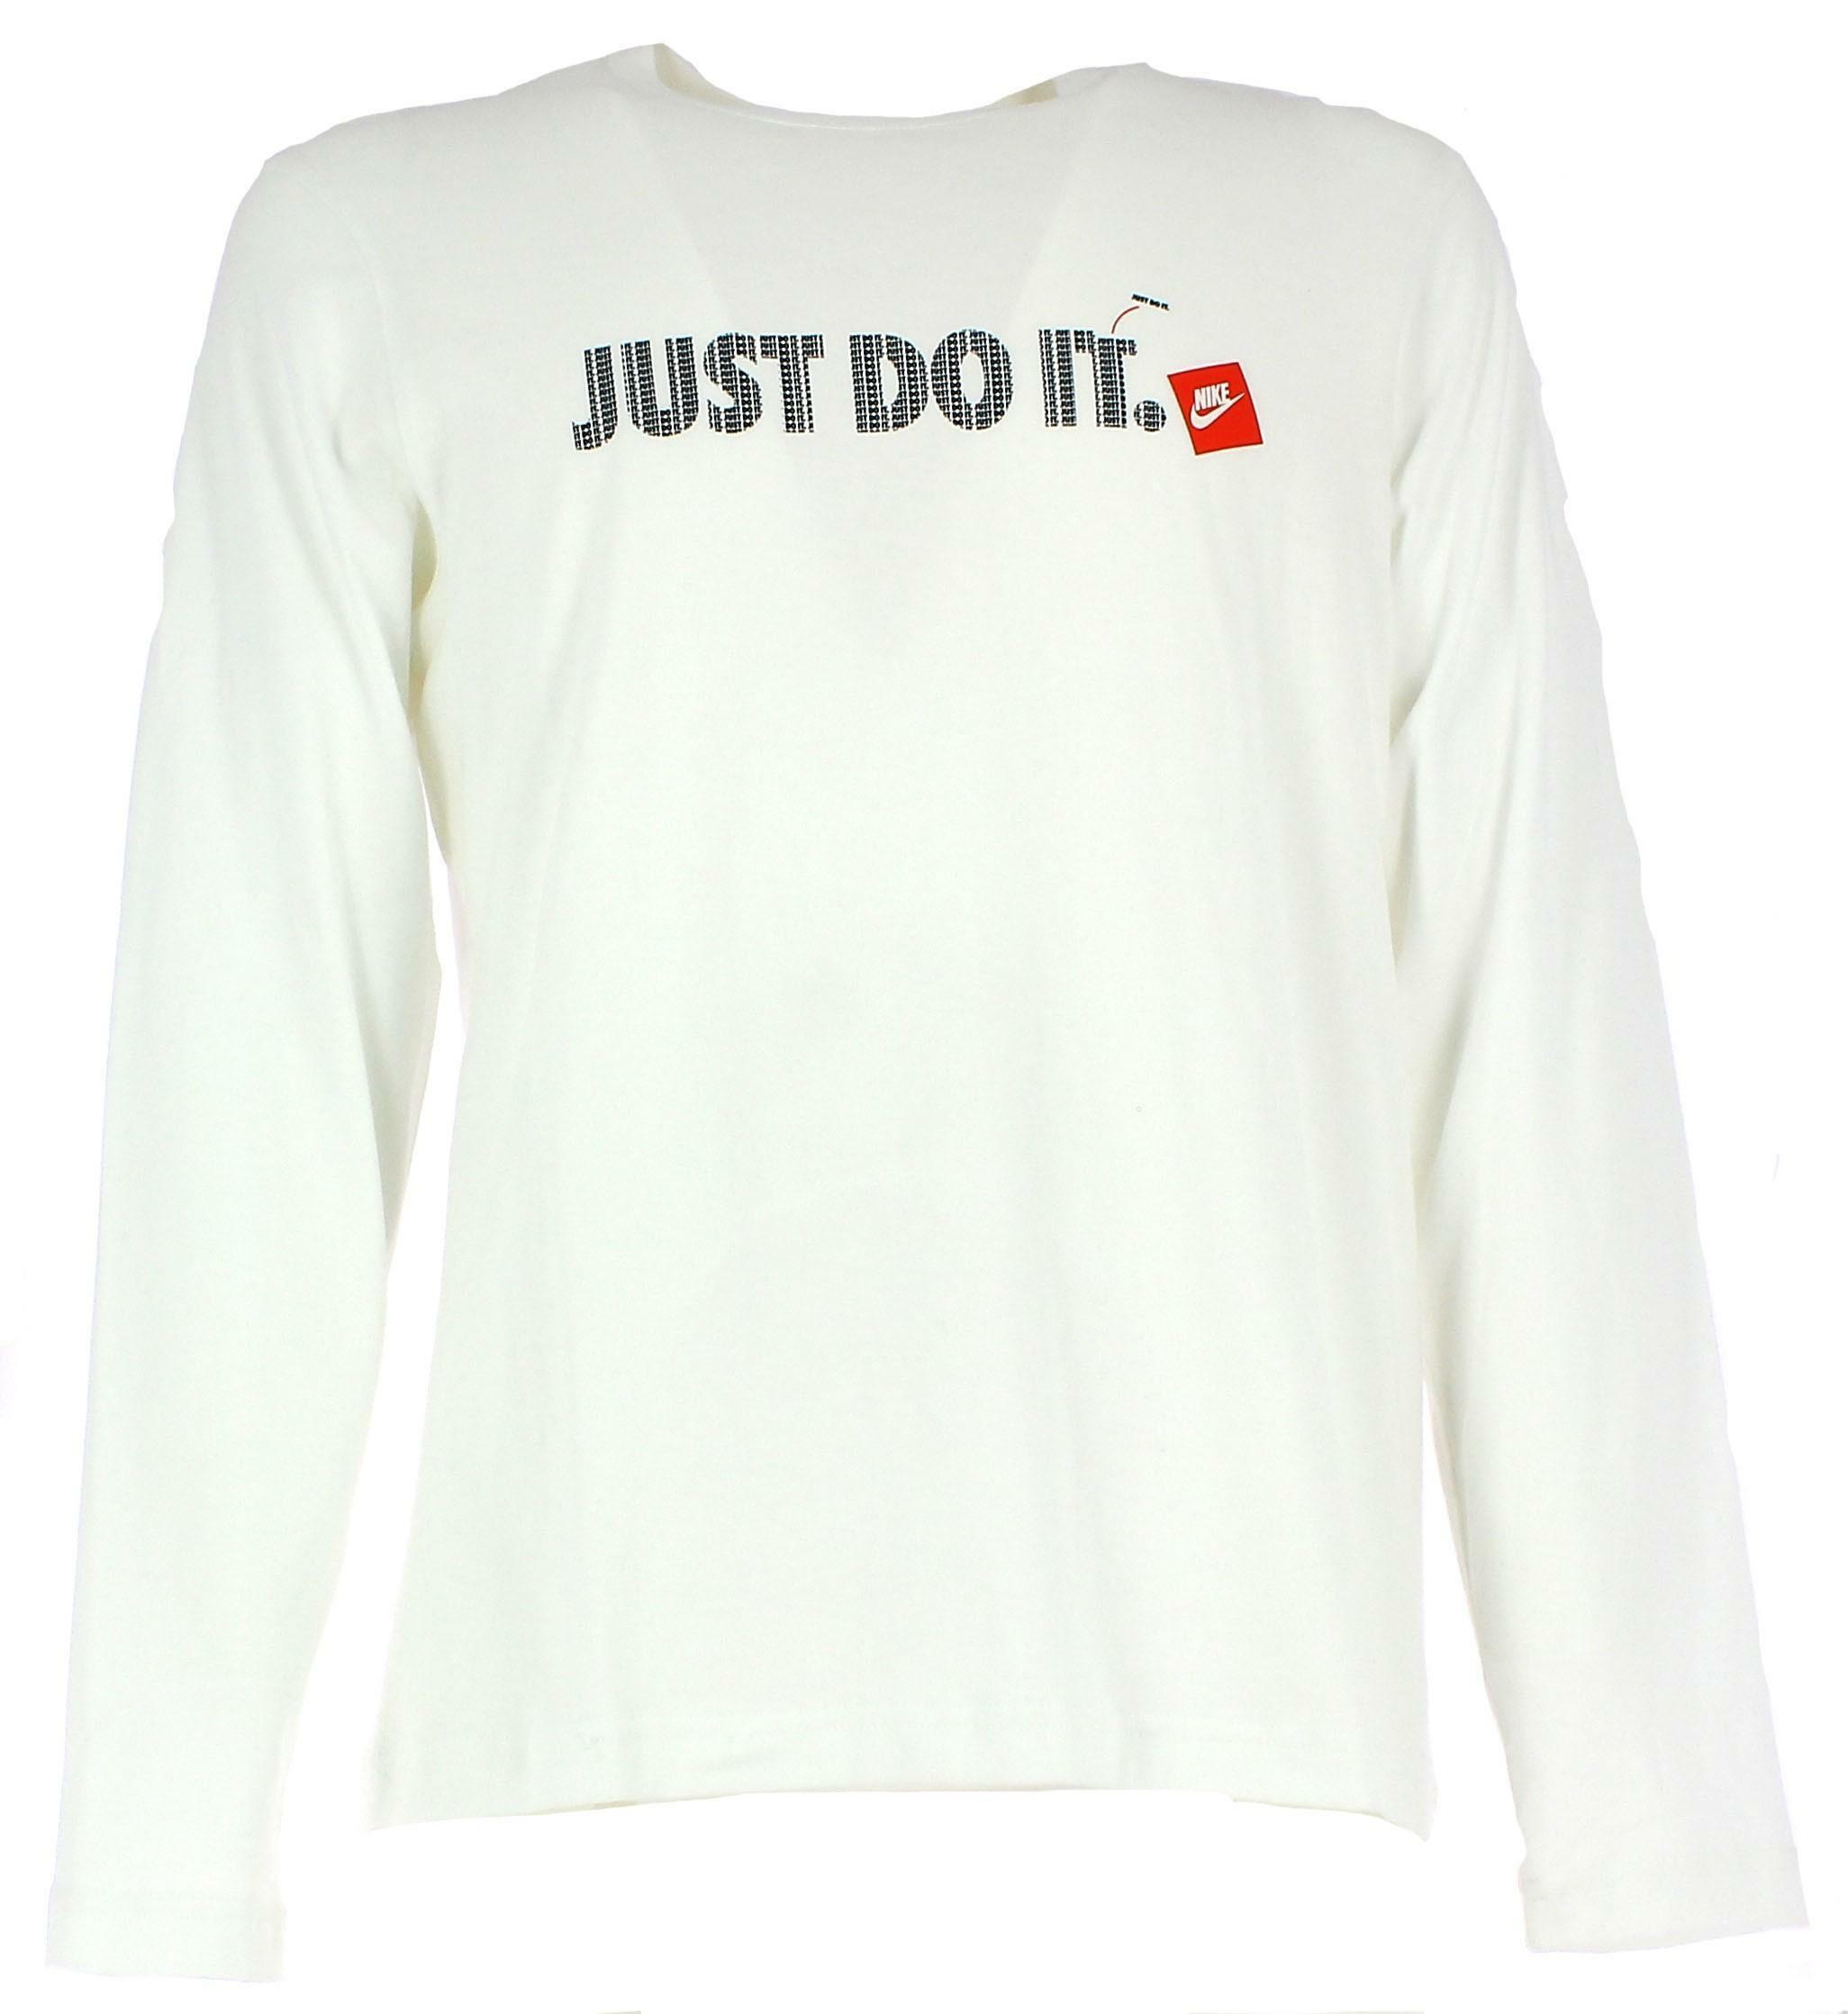 Nike t shirt manica lunga uomo bianca cotone